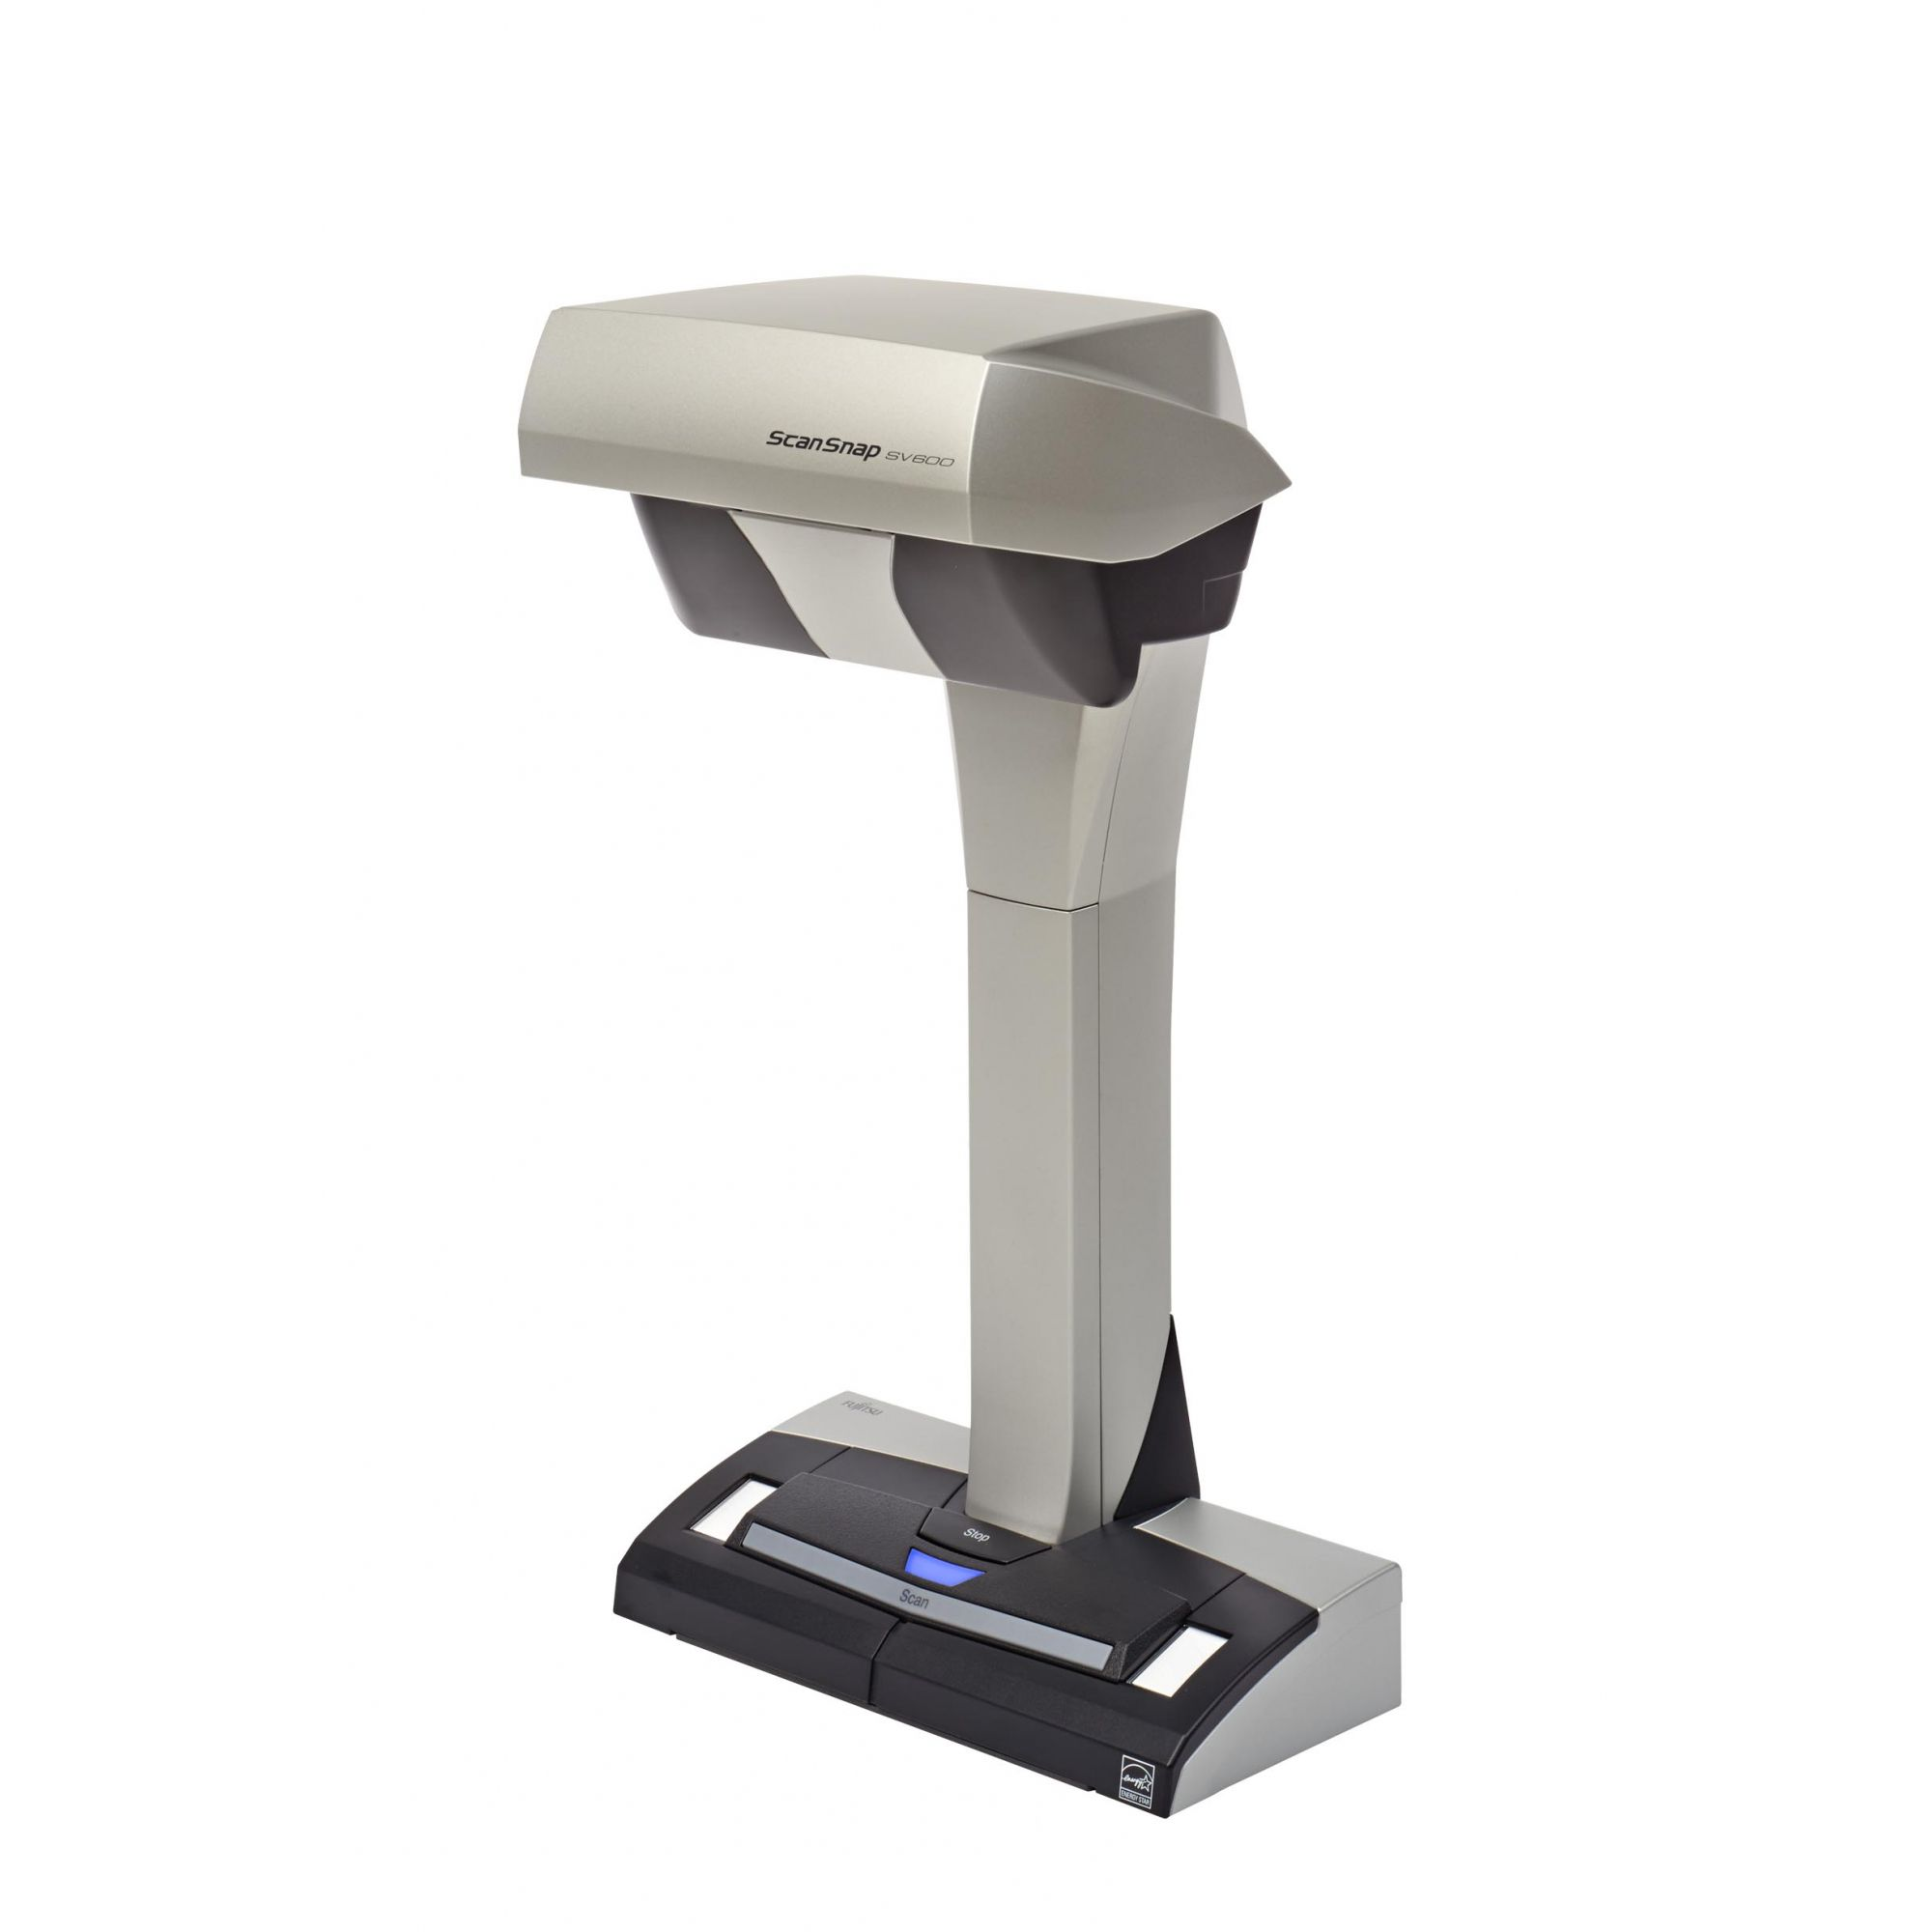 Foto Produto Scanner Fujitsu SV600, 20ppm, Simplex (Frente)